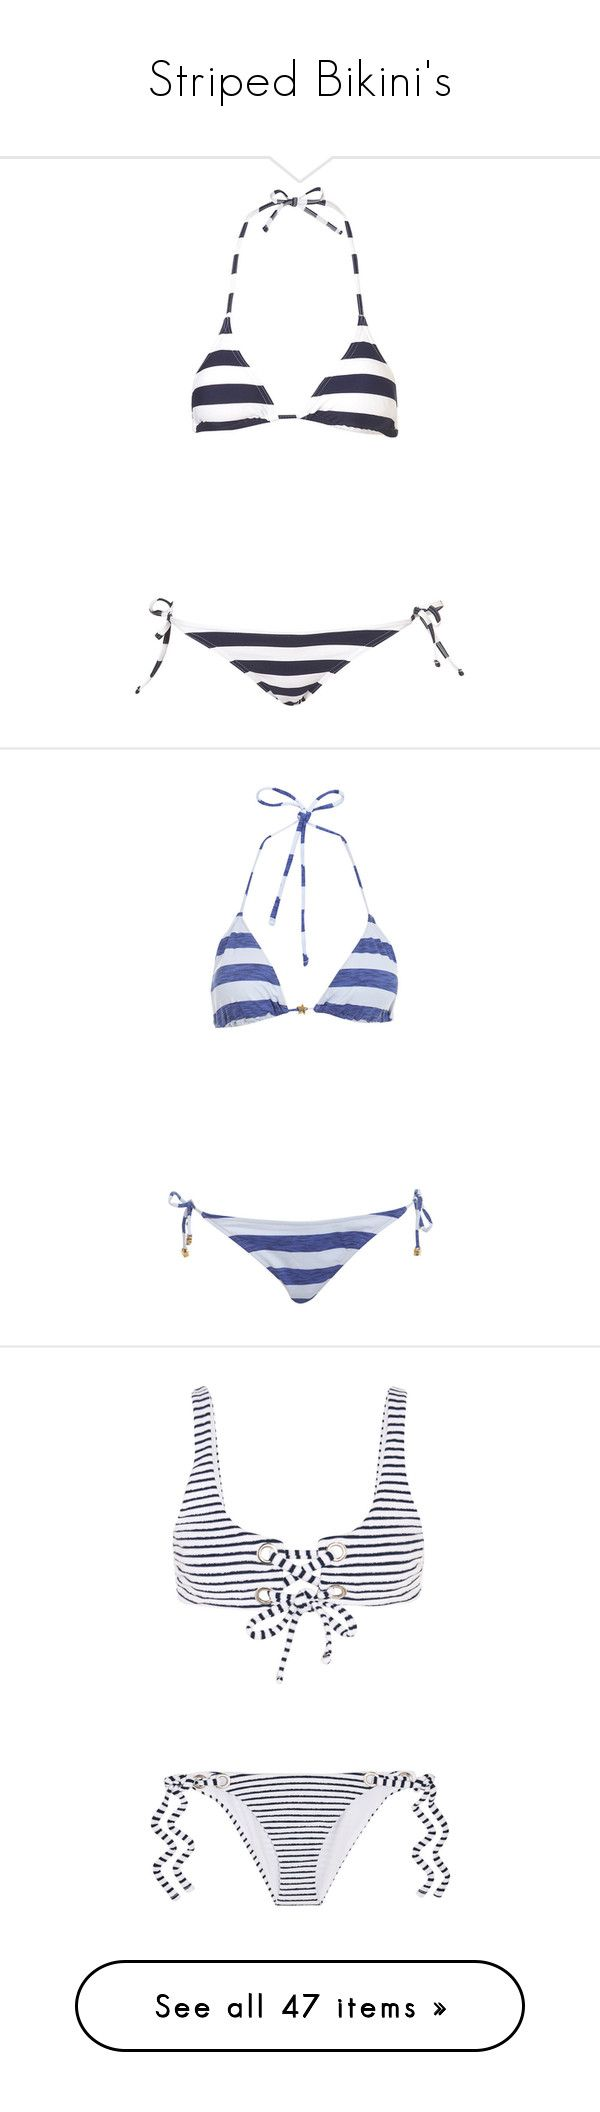 """Striped Bikini's"" by katyplops ❤ liked on Polyvore featuring swimwear, bikinis, swimsuits, bathing suits, swim, women, bikini bathing suits, swim suits, stripe bikini and swimming costume"